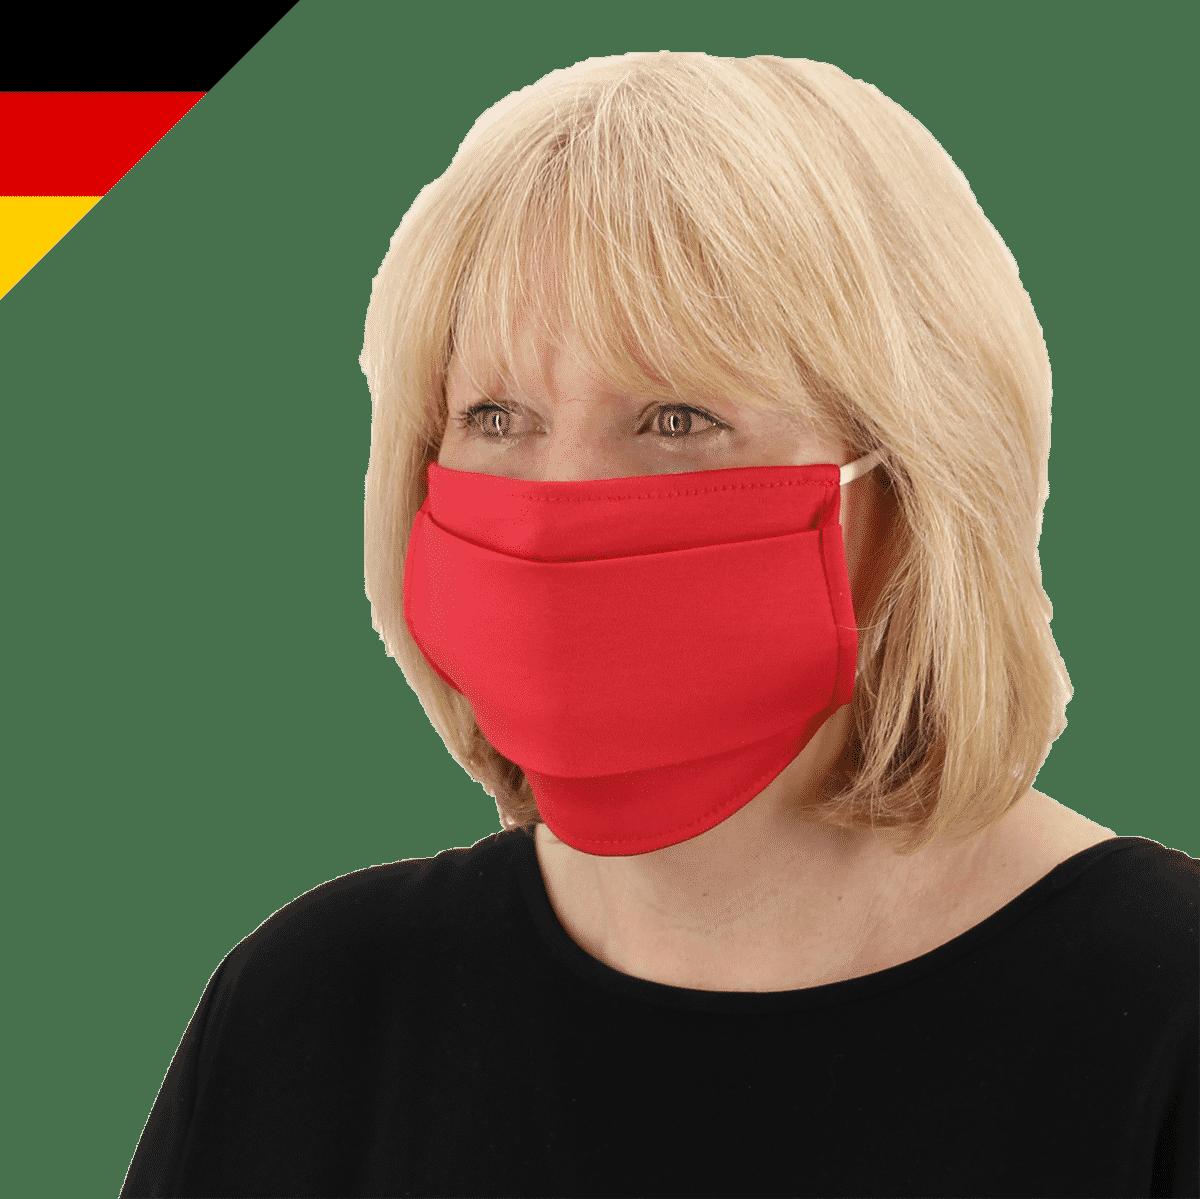 Maske mit Gummiband Made in Germany